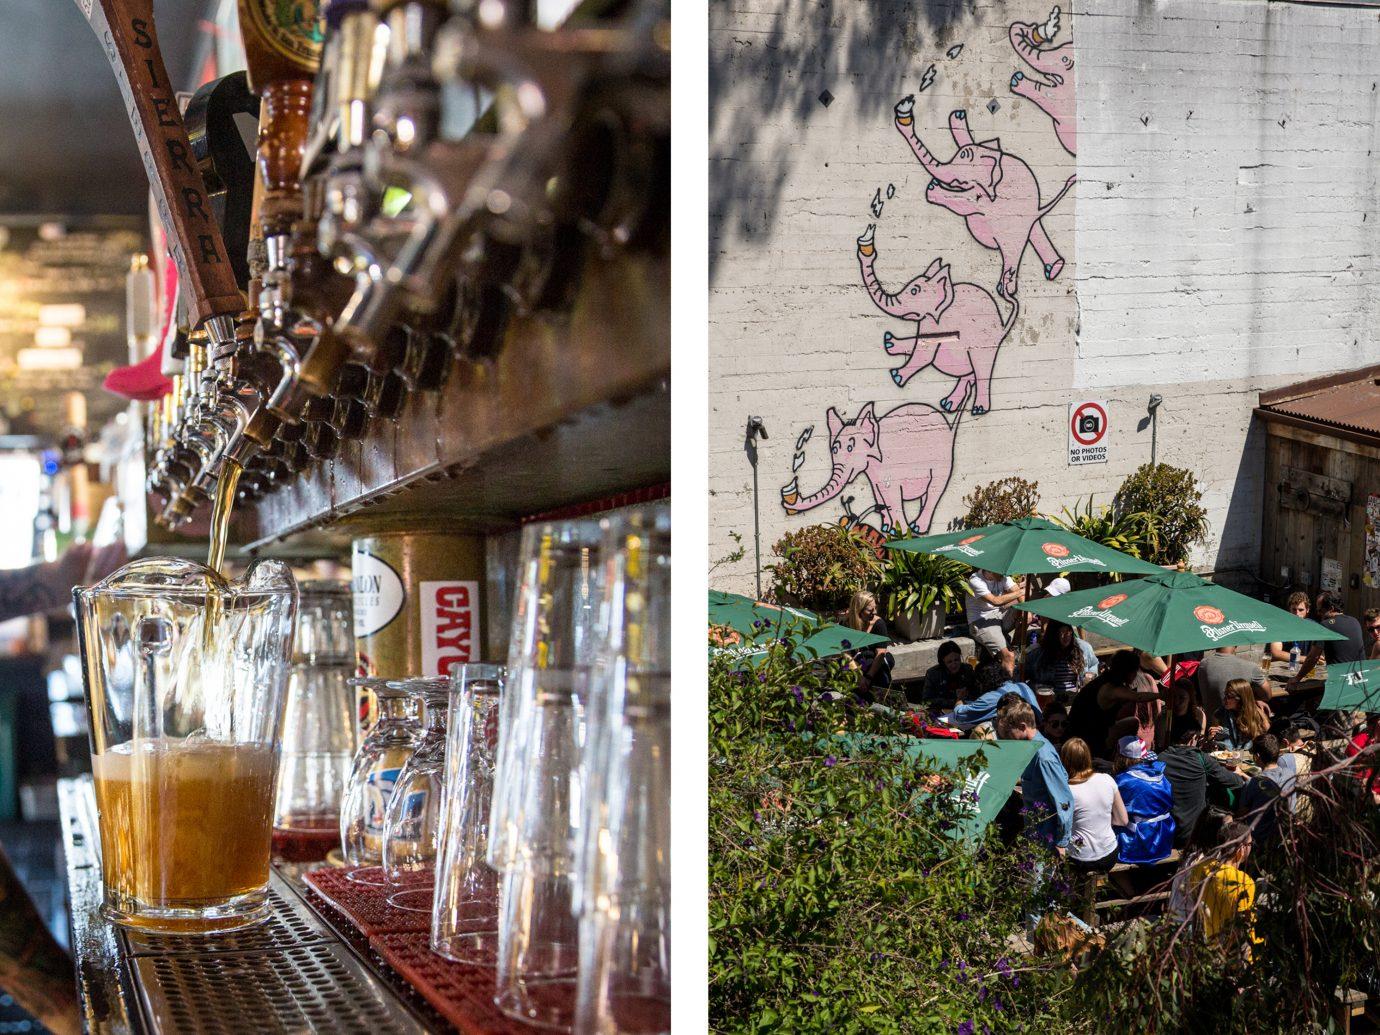 Food + Drink City public space human settlement market bazaar several